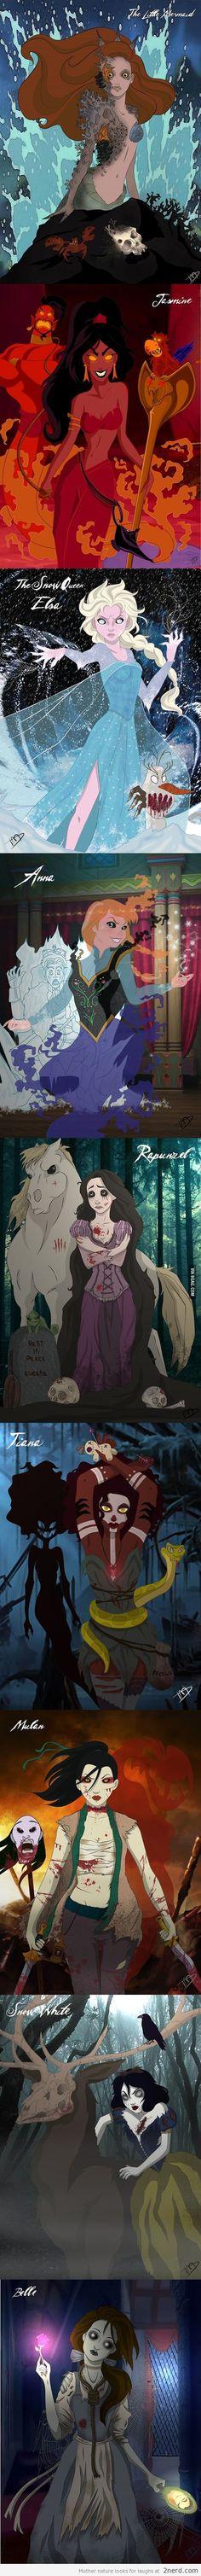 Disney Princesses switched up a bit - http://2nerd.com/funny-pics/disney-princesses-switched-bit/